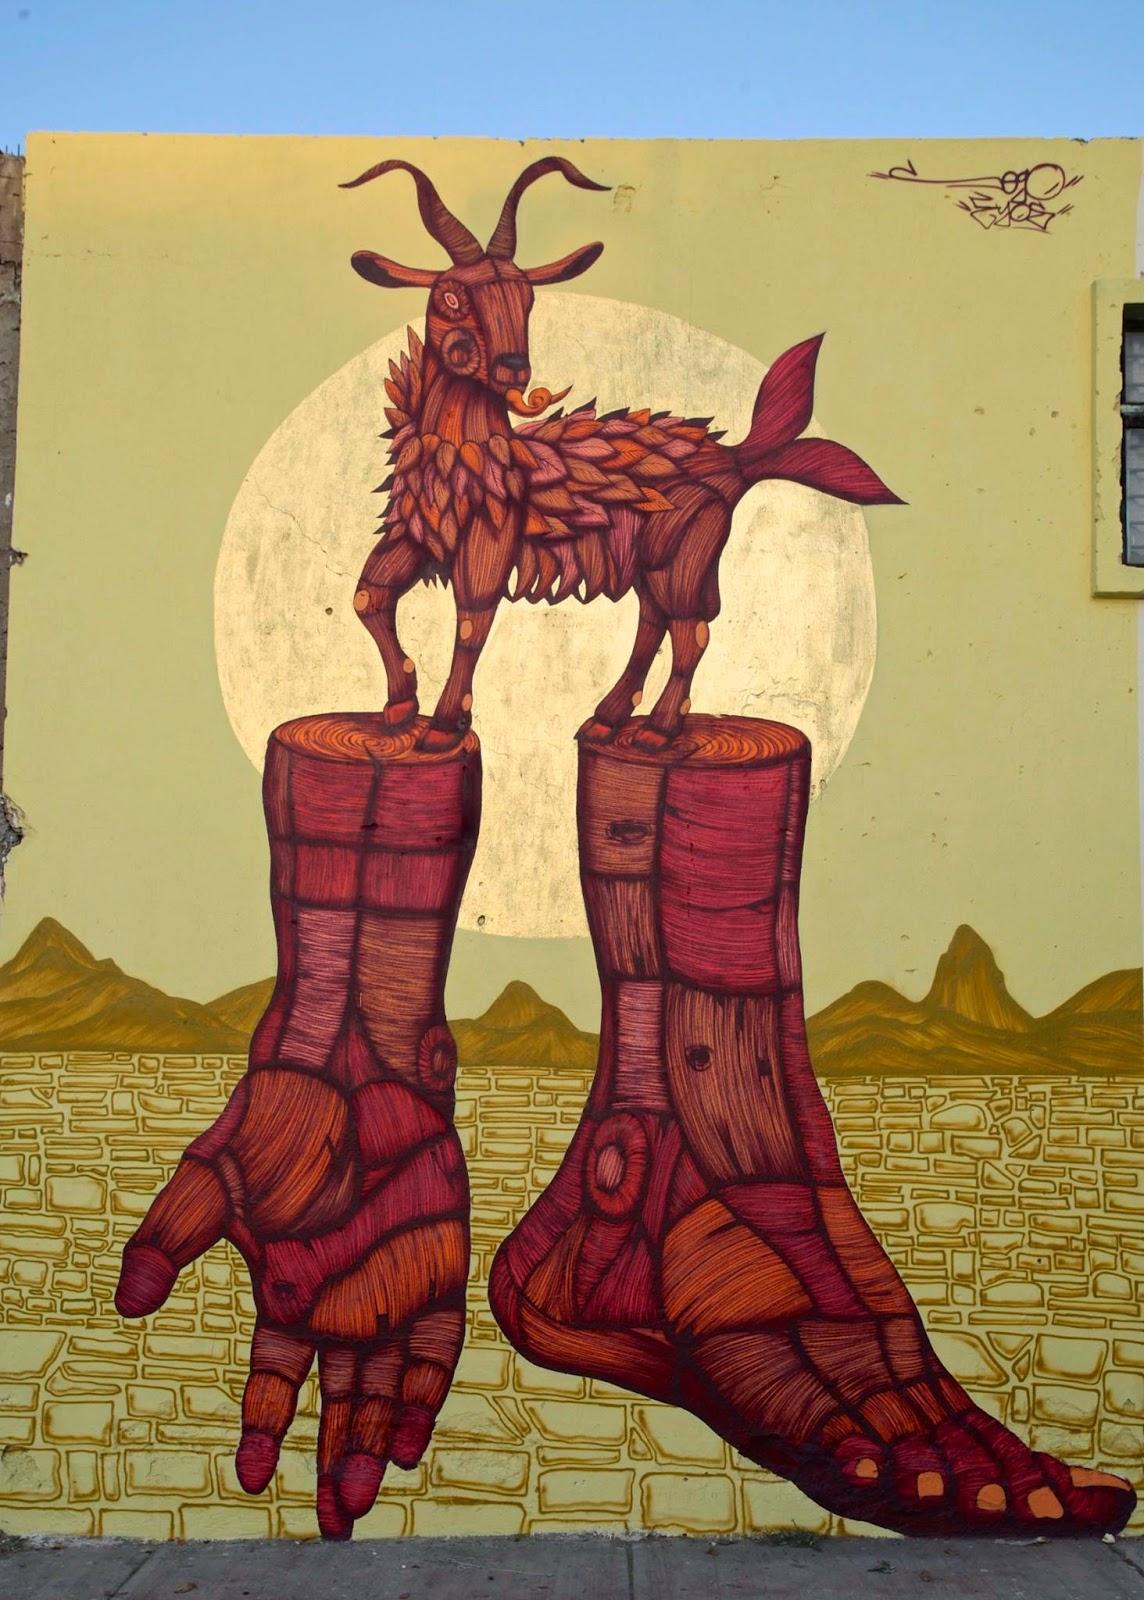 sego el presagio de la cabra loca new mural tonal mexico streetartnews streetartnews. Black Bedroom Furniture Sets. Home Design Ideas